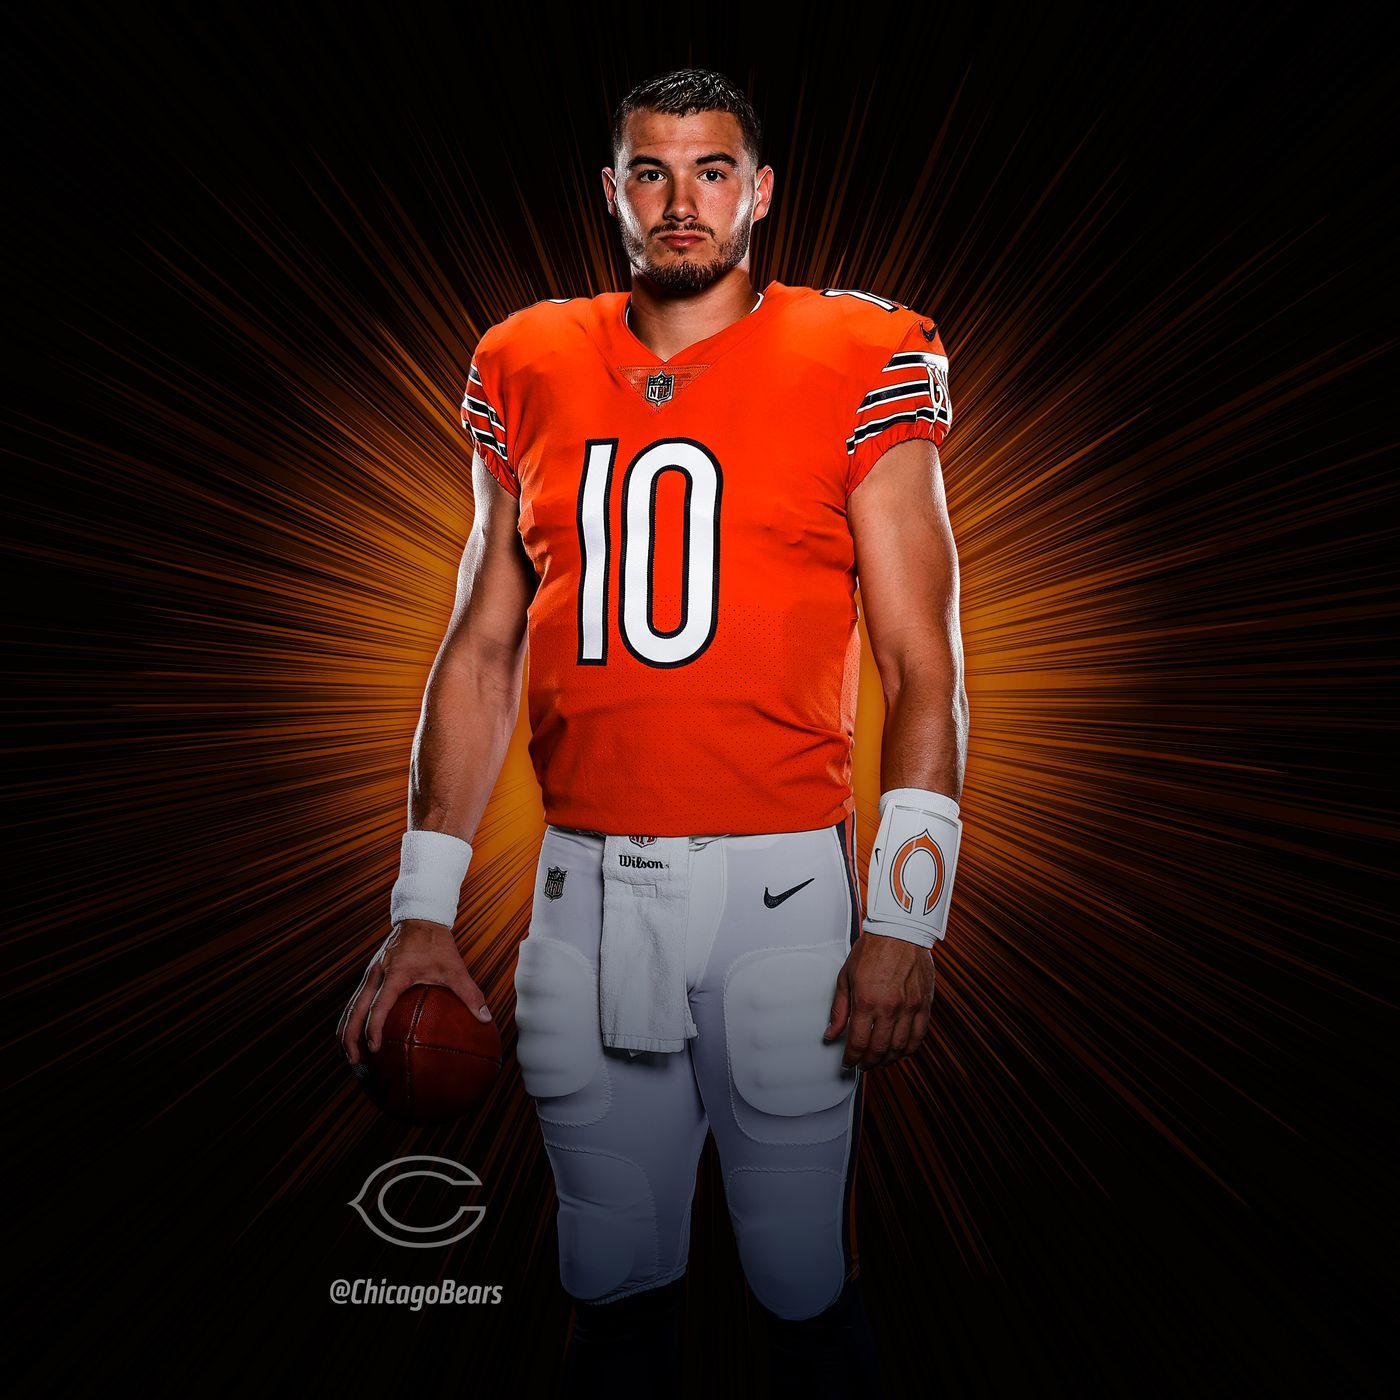 quality design 8ad89 44493 Chicago Bears release new orange jerseys for 2018 season ...